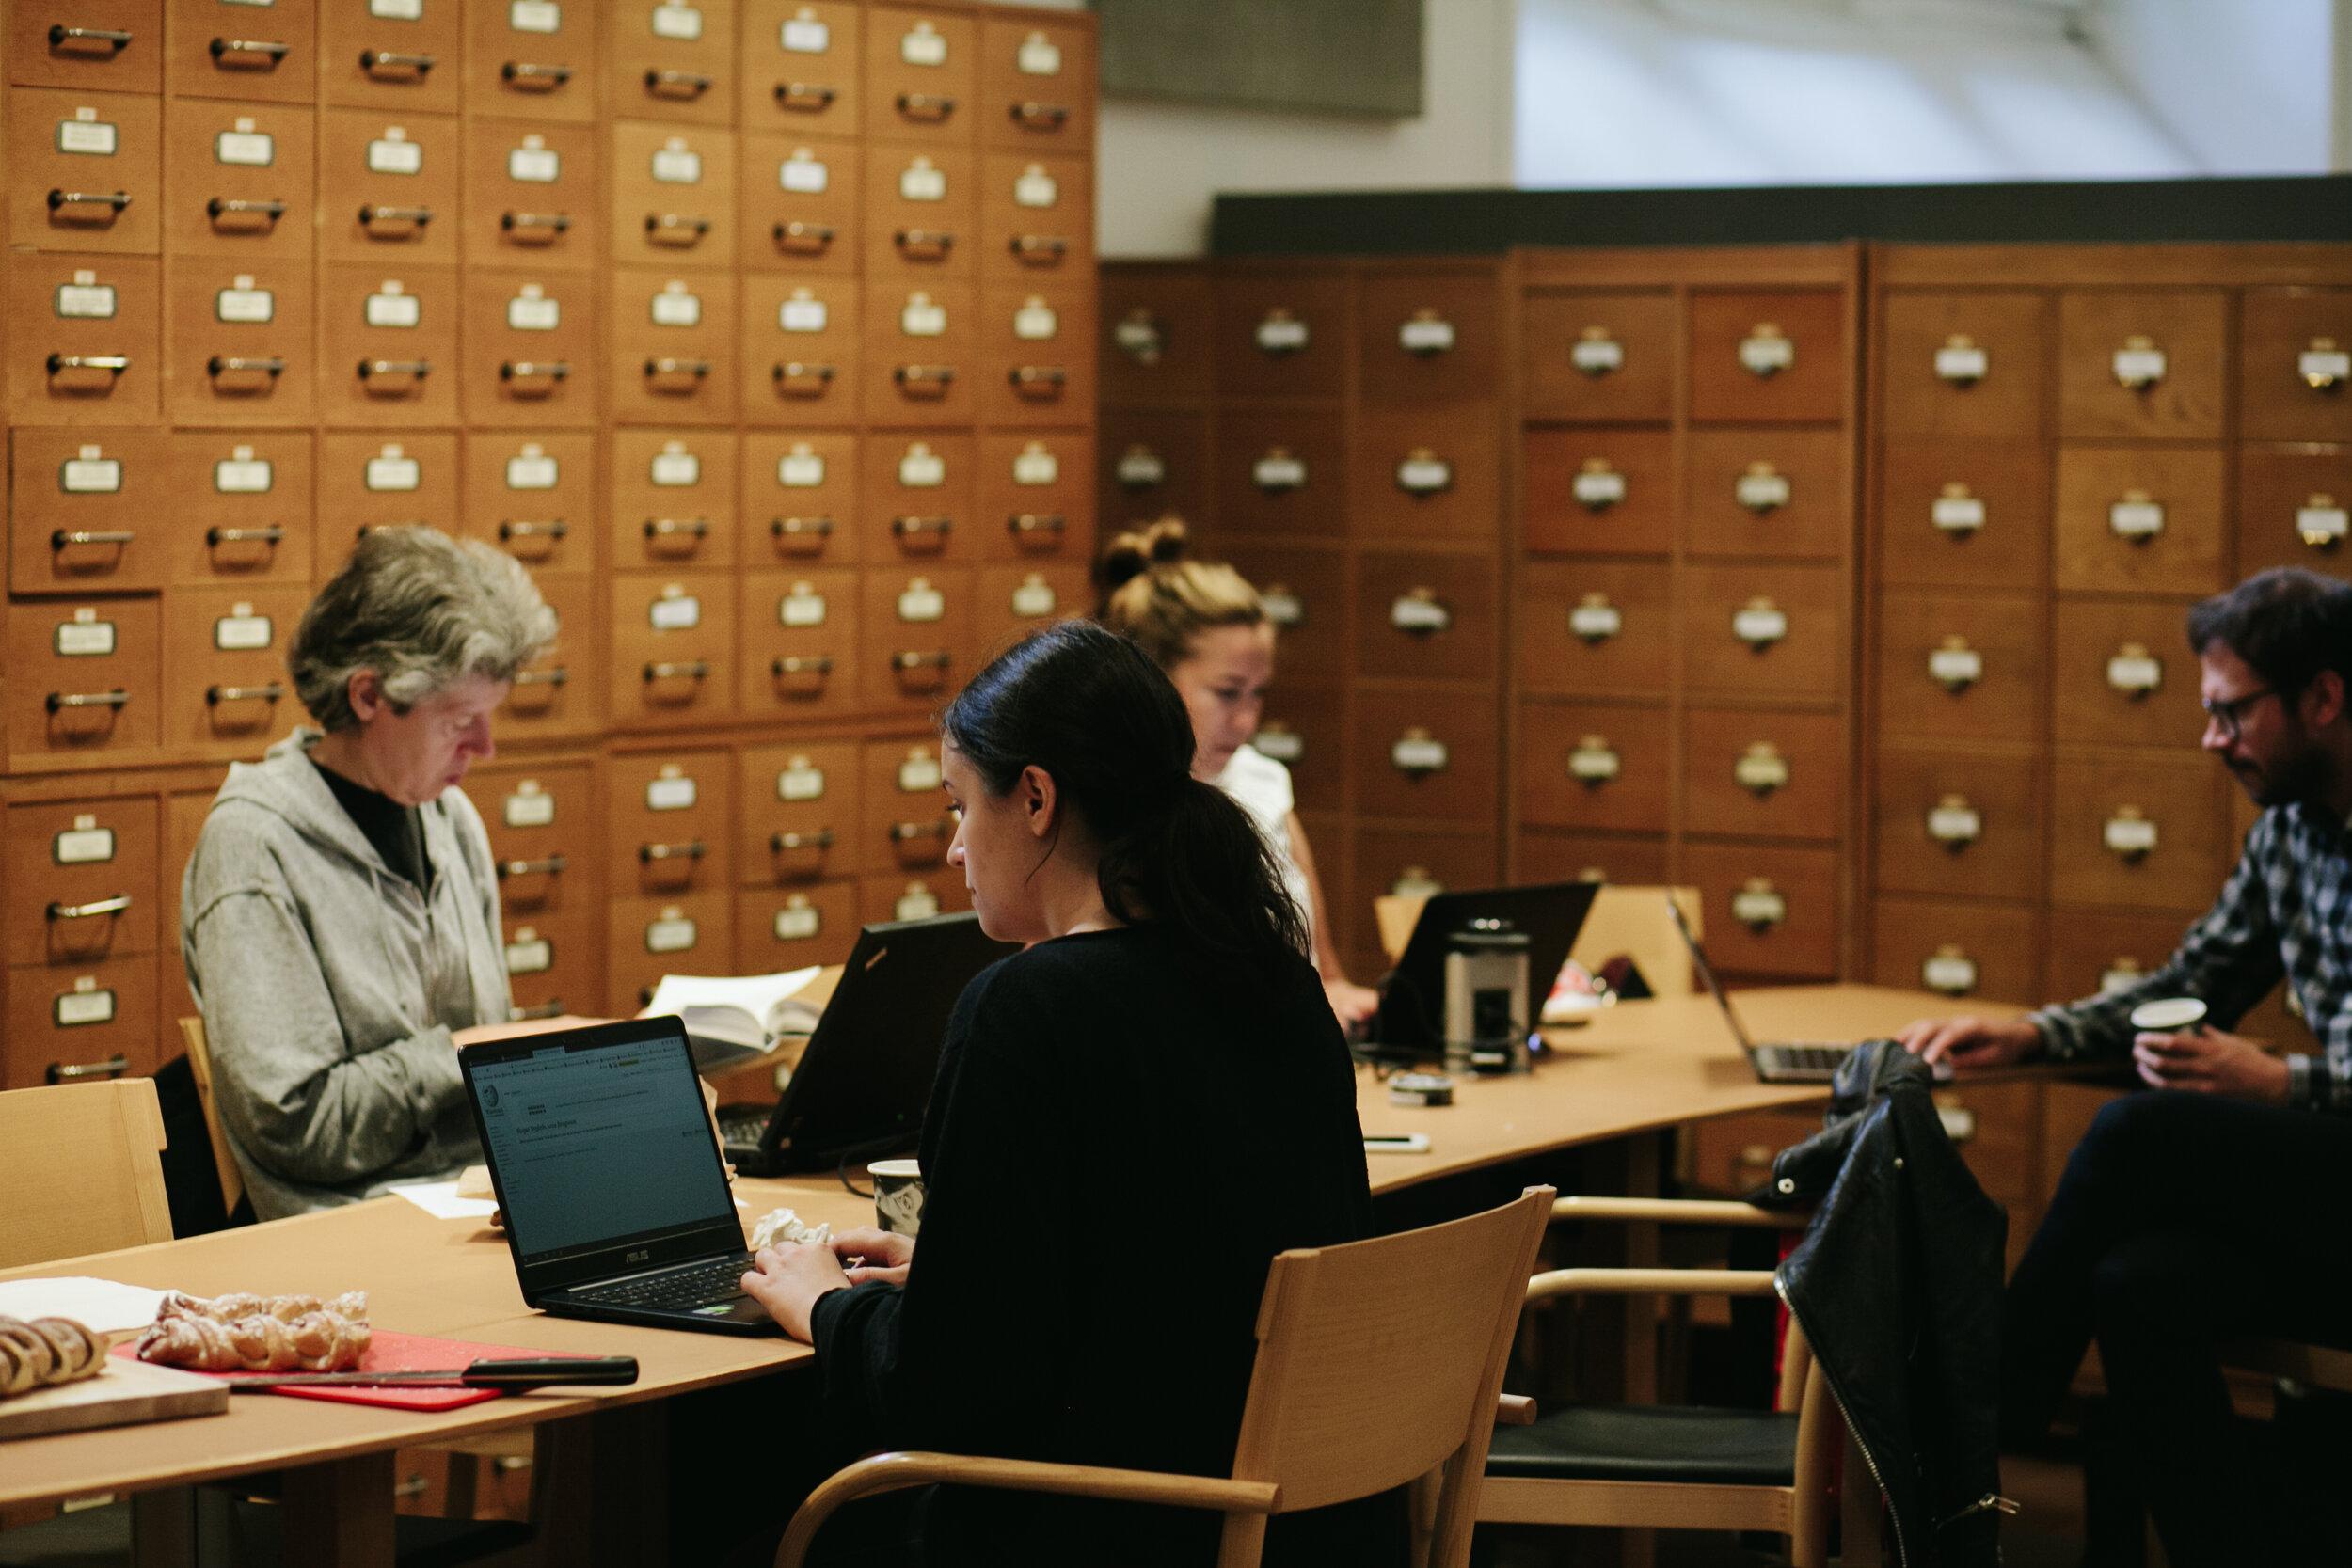 Skrivstuga_Wiki_SandraÅhman-9851.jpg